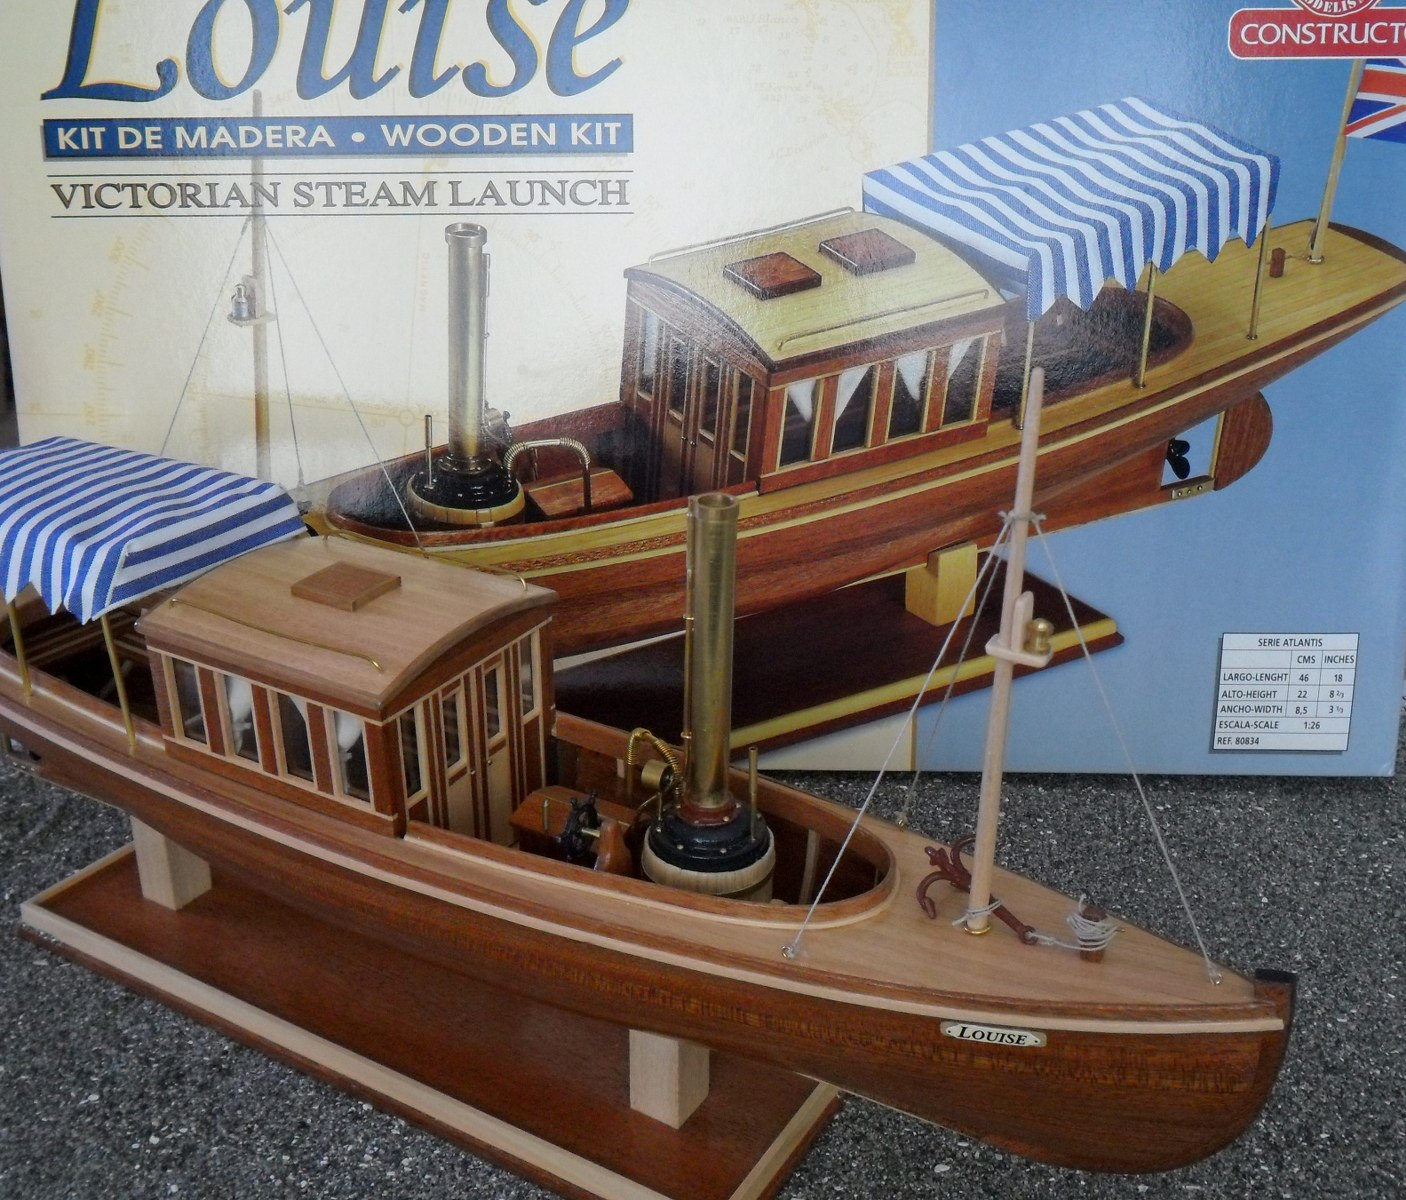 Louise015 (2) 1406x1200